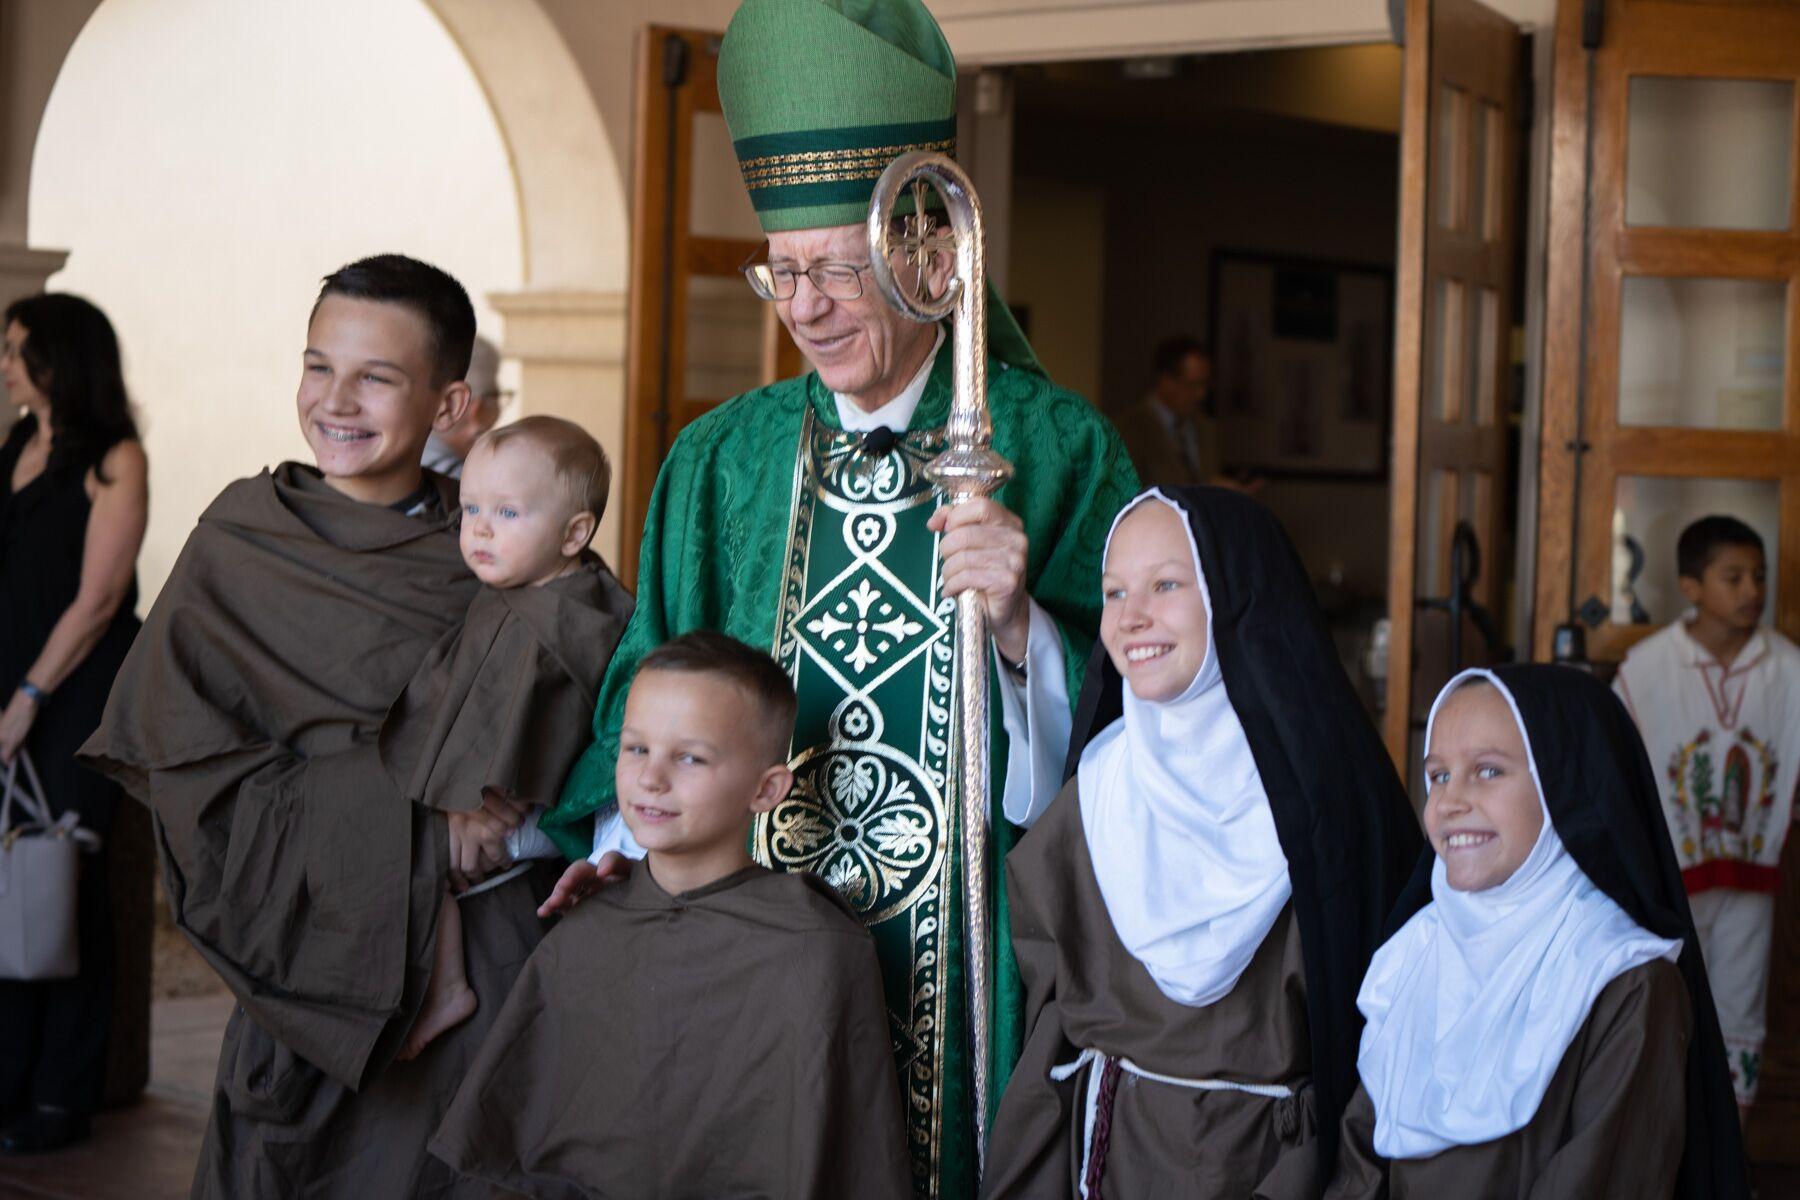 Bishop with the Zucks